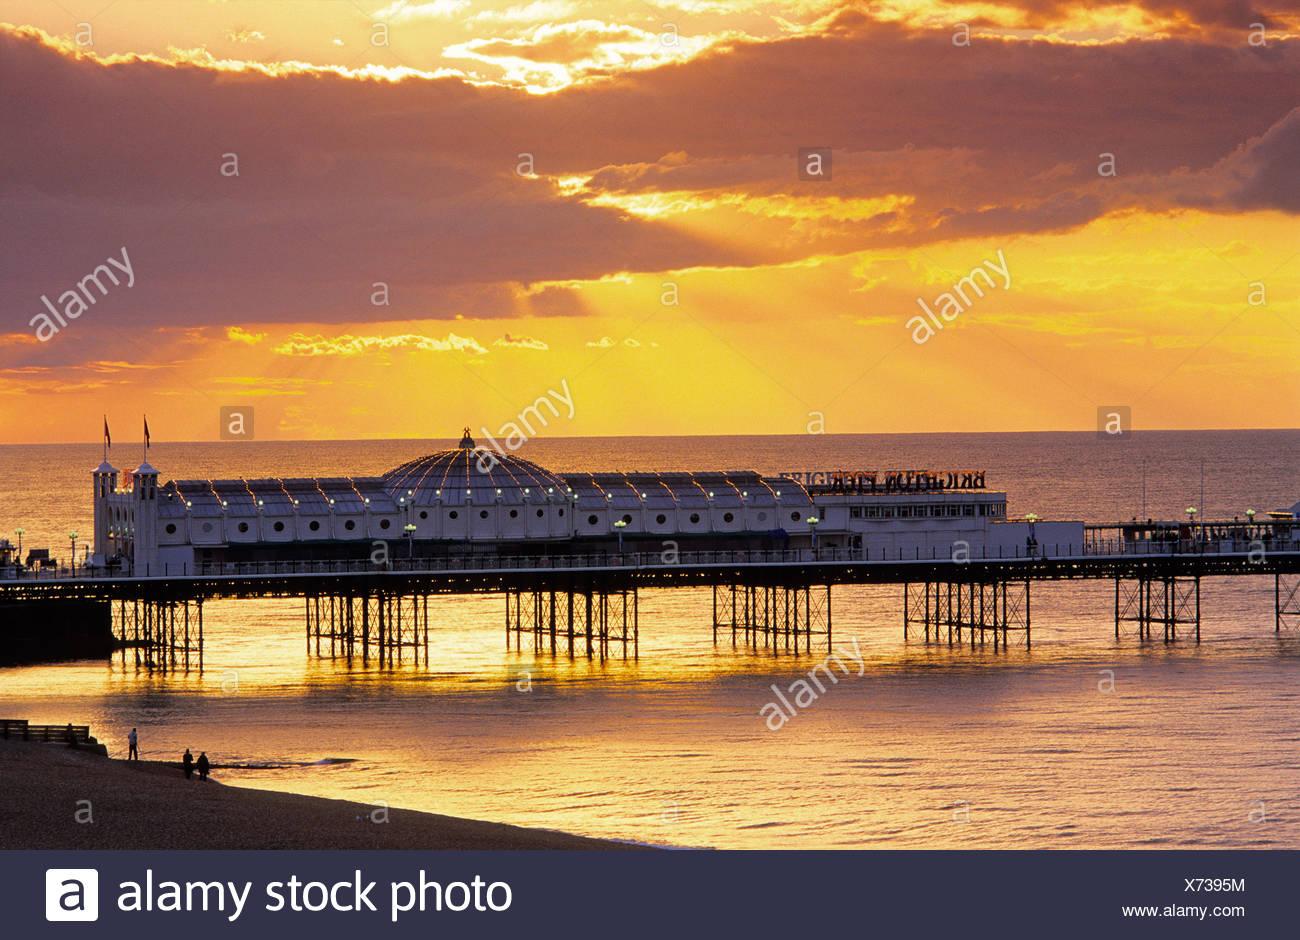 Europe, England, East Sussex, Brighton, Brighton Pier - Stock Image